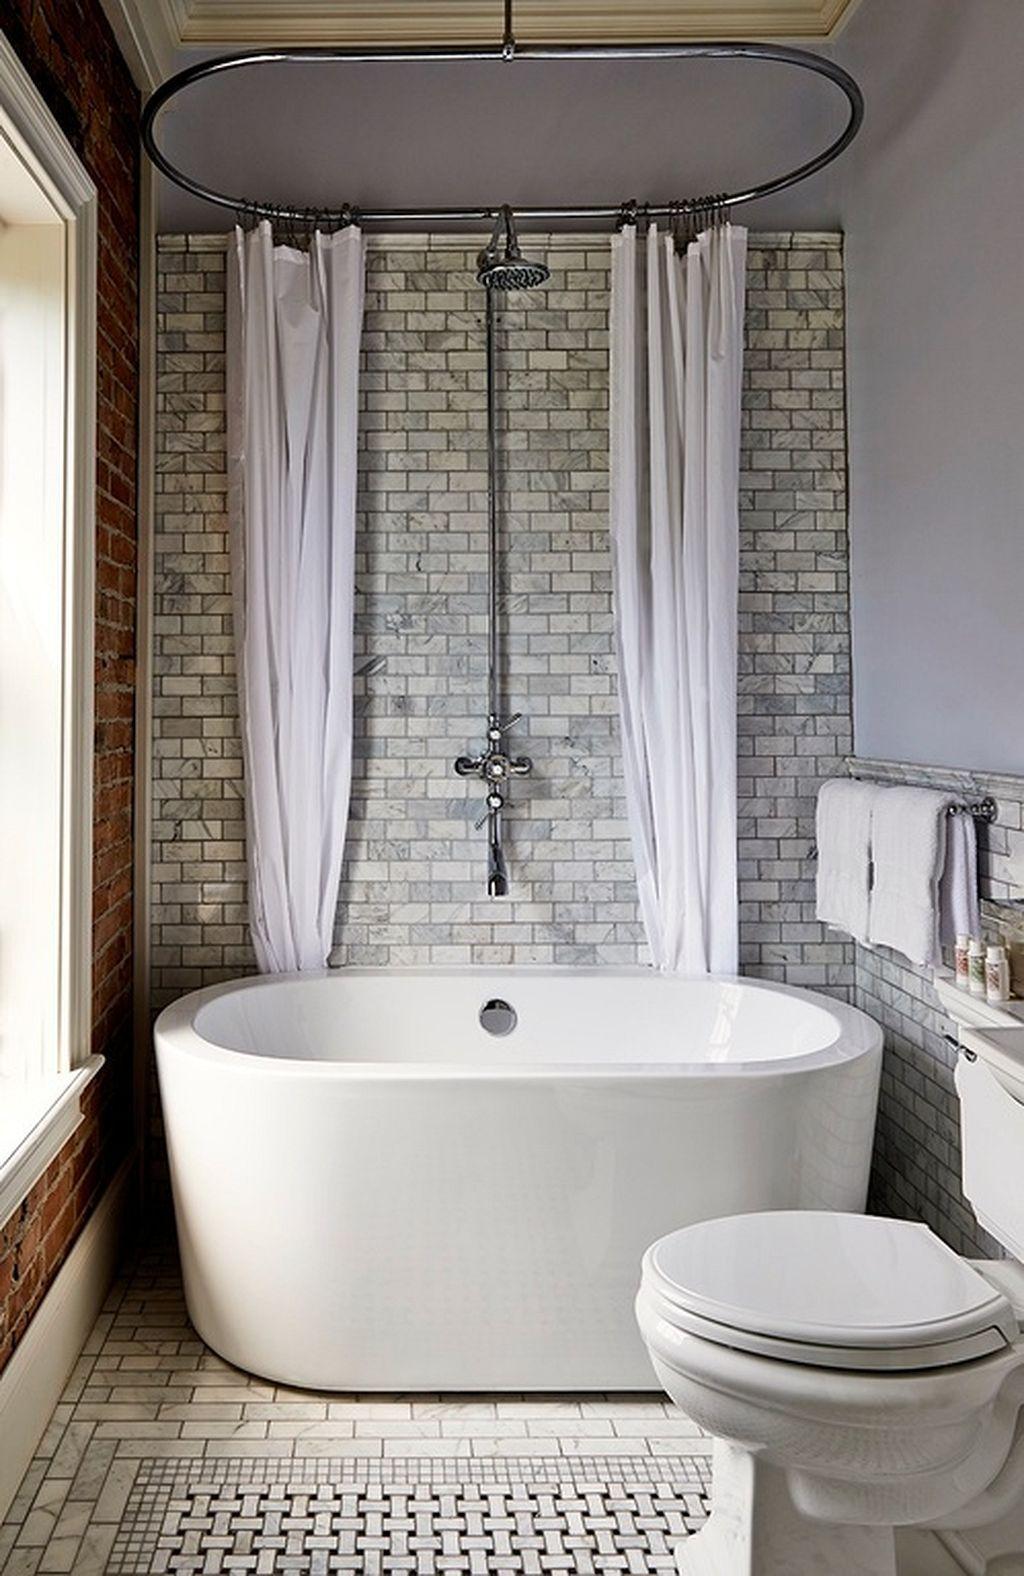 Small Soaking Tub Inside Walk In Shower Combination Combo Bathroom Tub Shower Combo Bathroom Tub Shower Small Bathroom With Tub